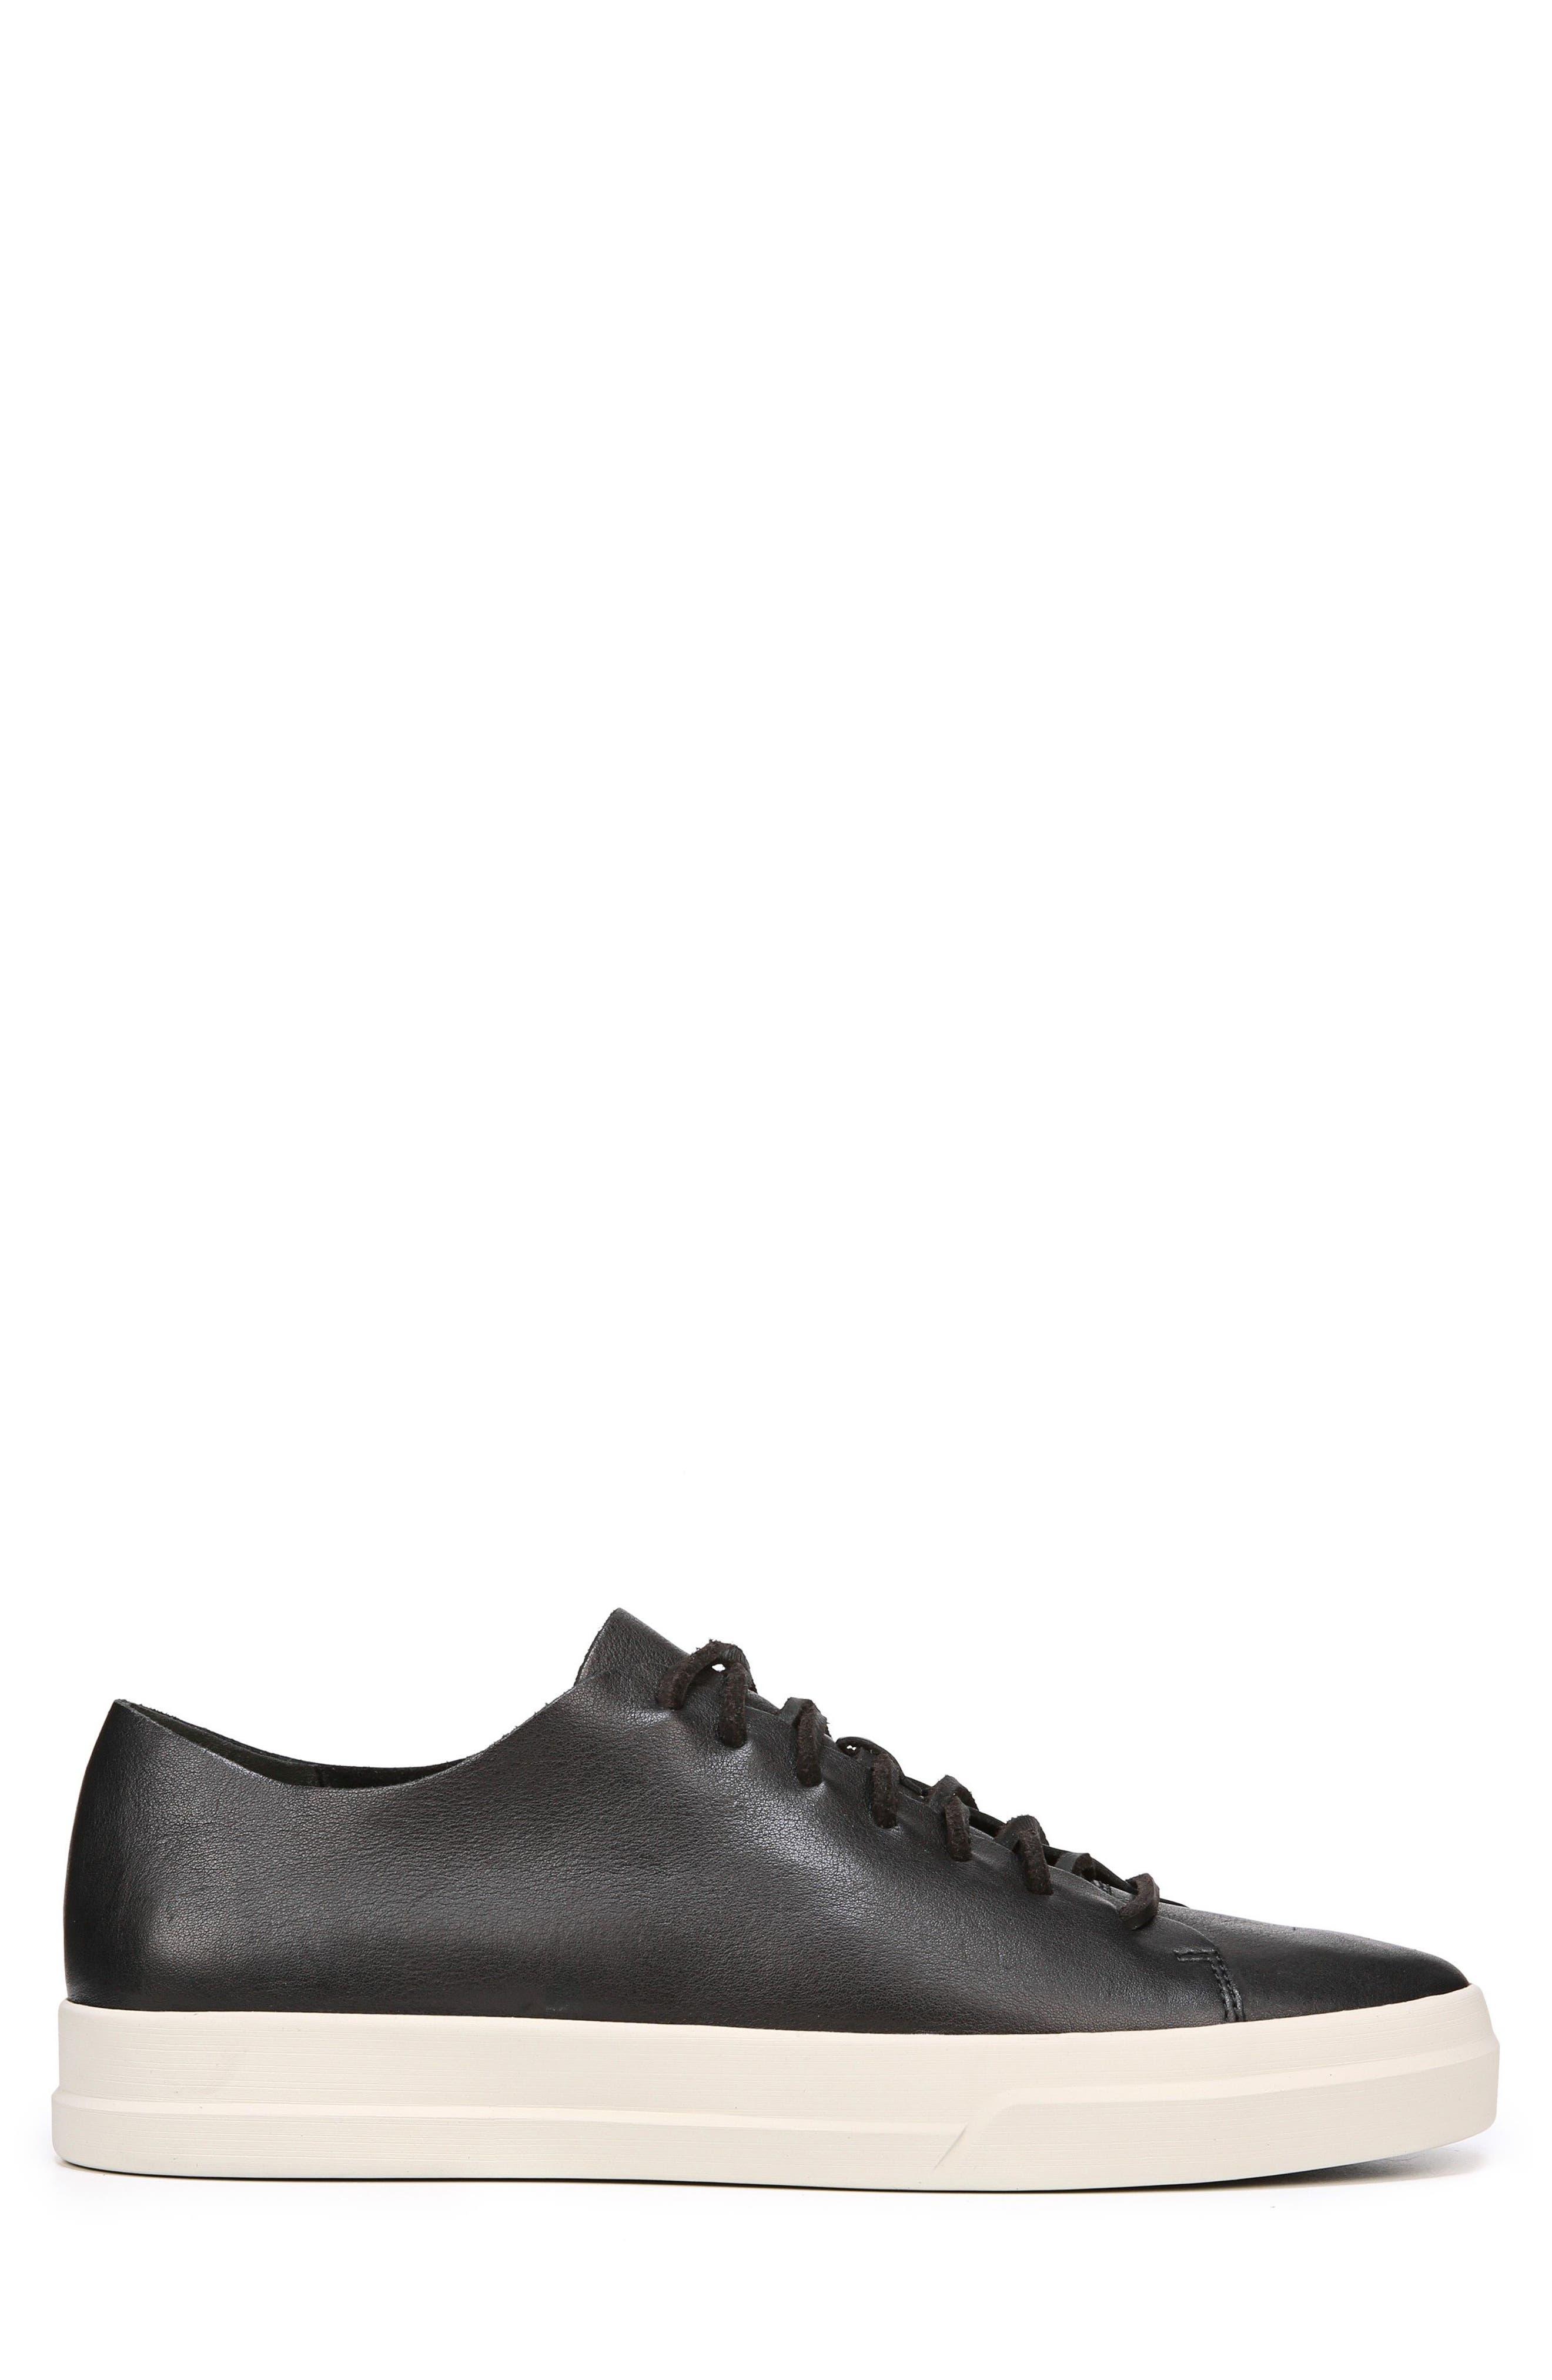 Copeland Sneaker,                             Alternate thumbnail 3, color,                             BLACK